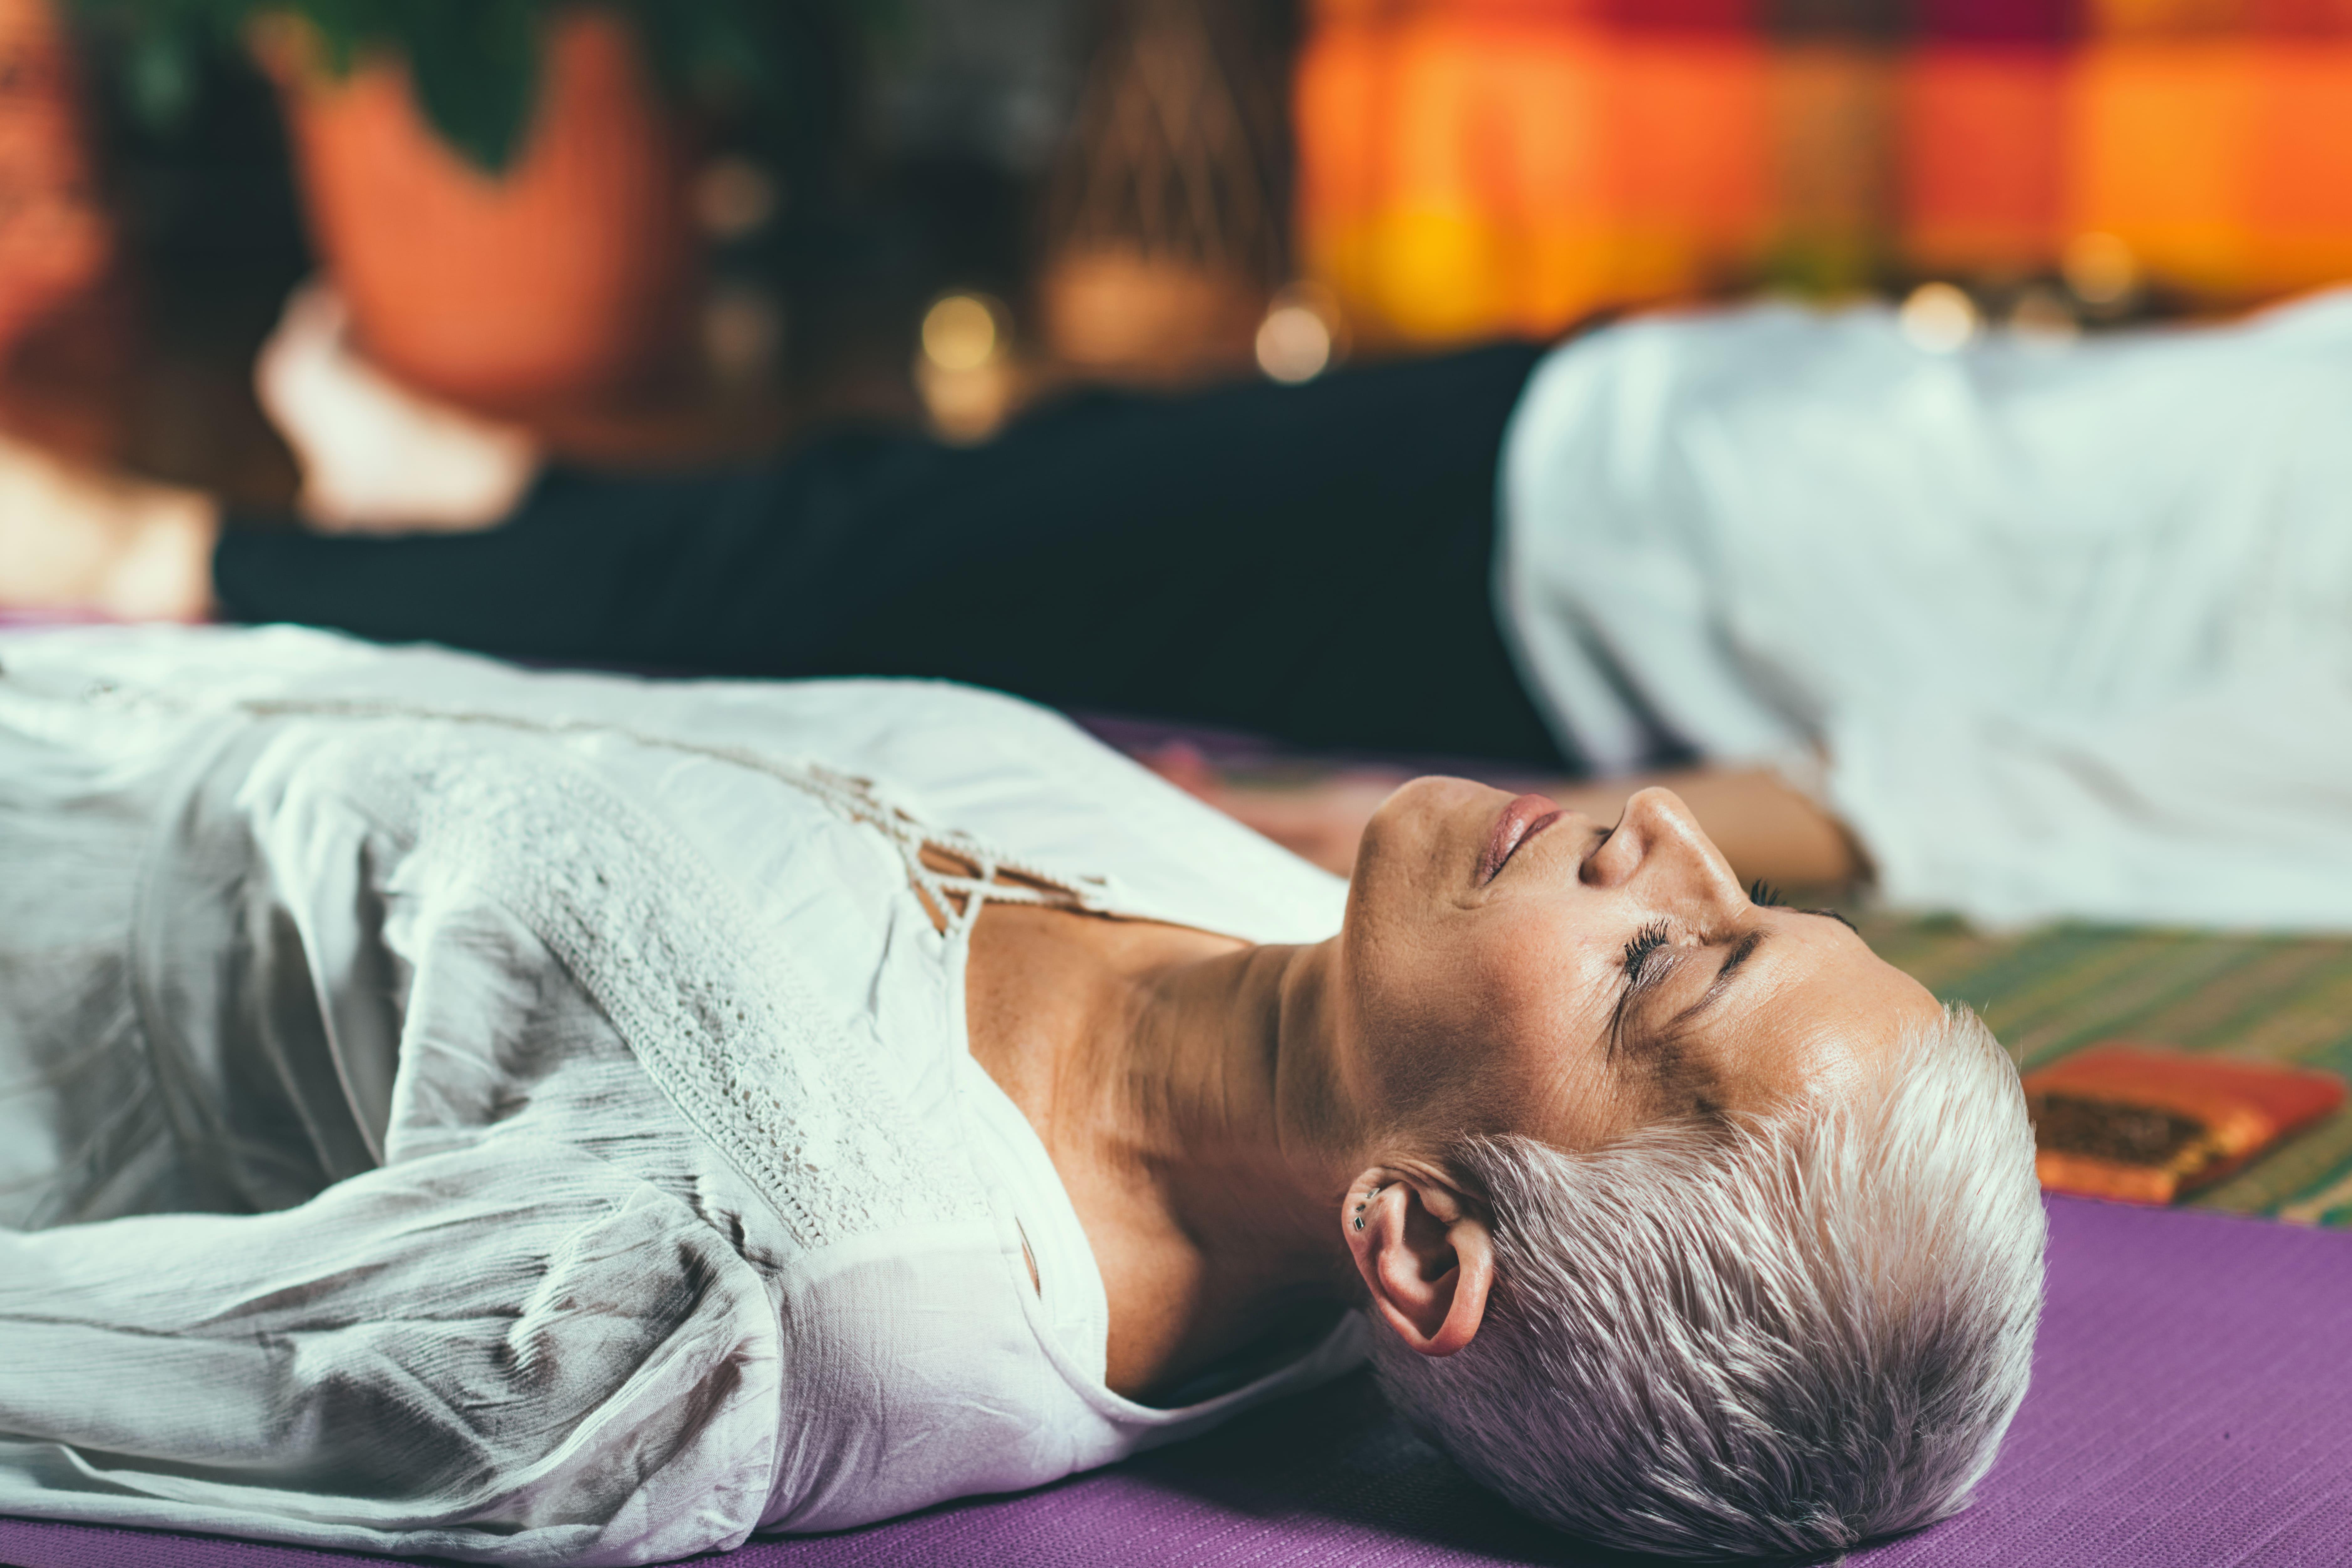 ayahuasca, psilocybin, 5 meo-dmt,  retreats, wellness, leaders, exectives